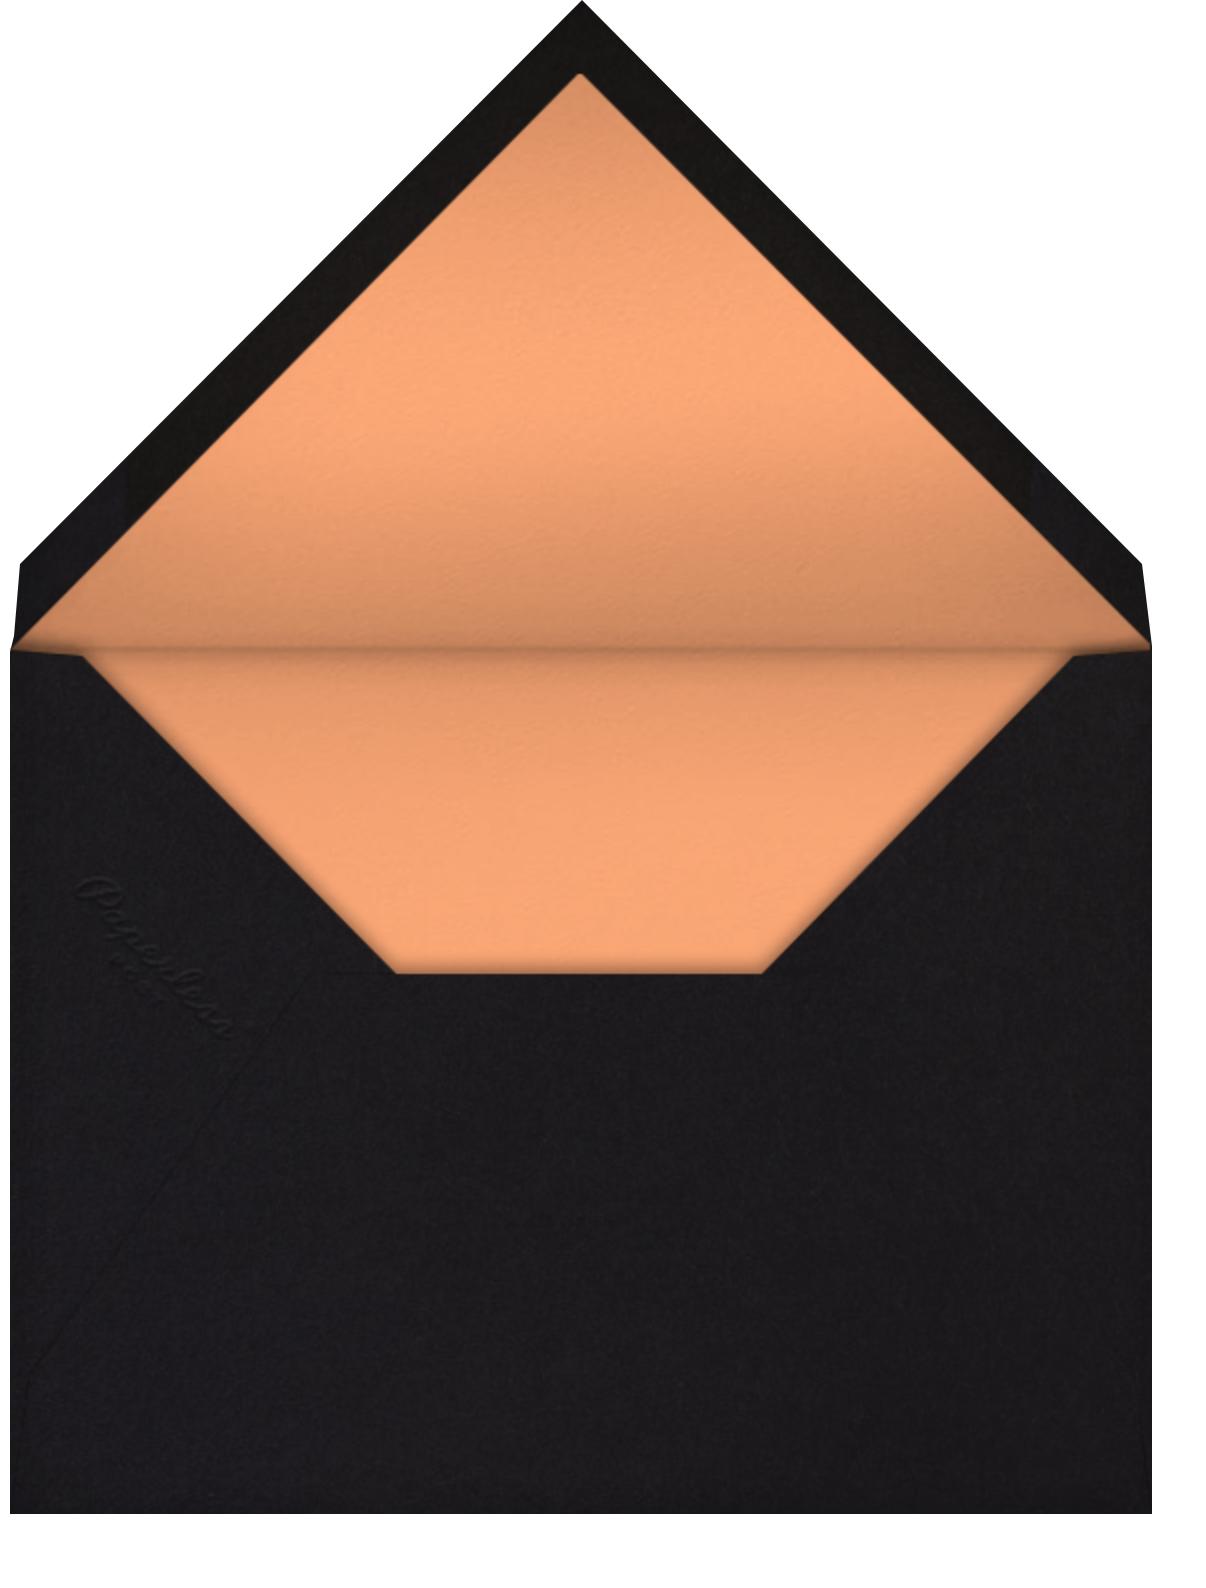 Aura - Orange - Radiant Human - Adult birthday - envelope back